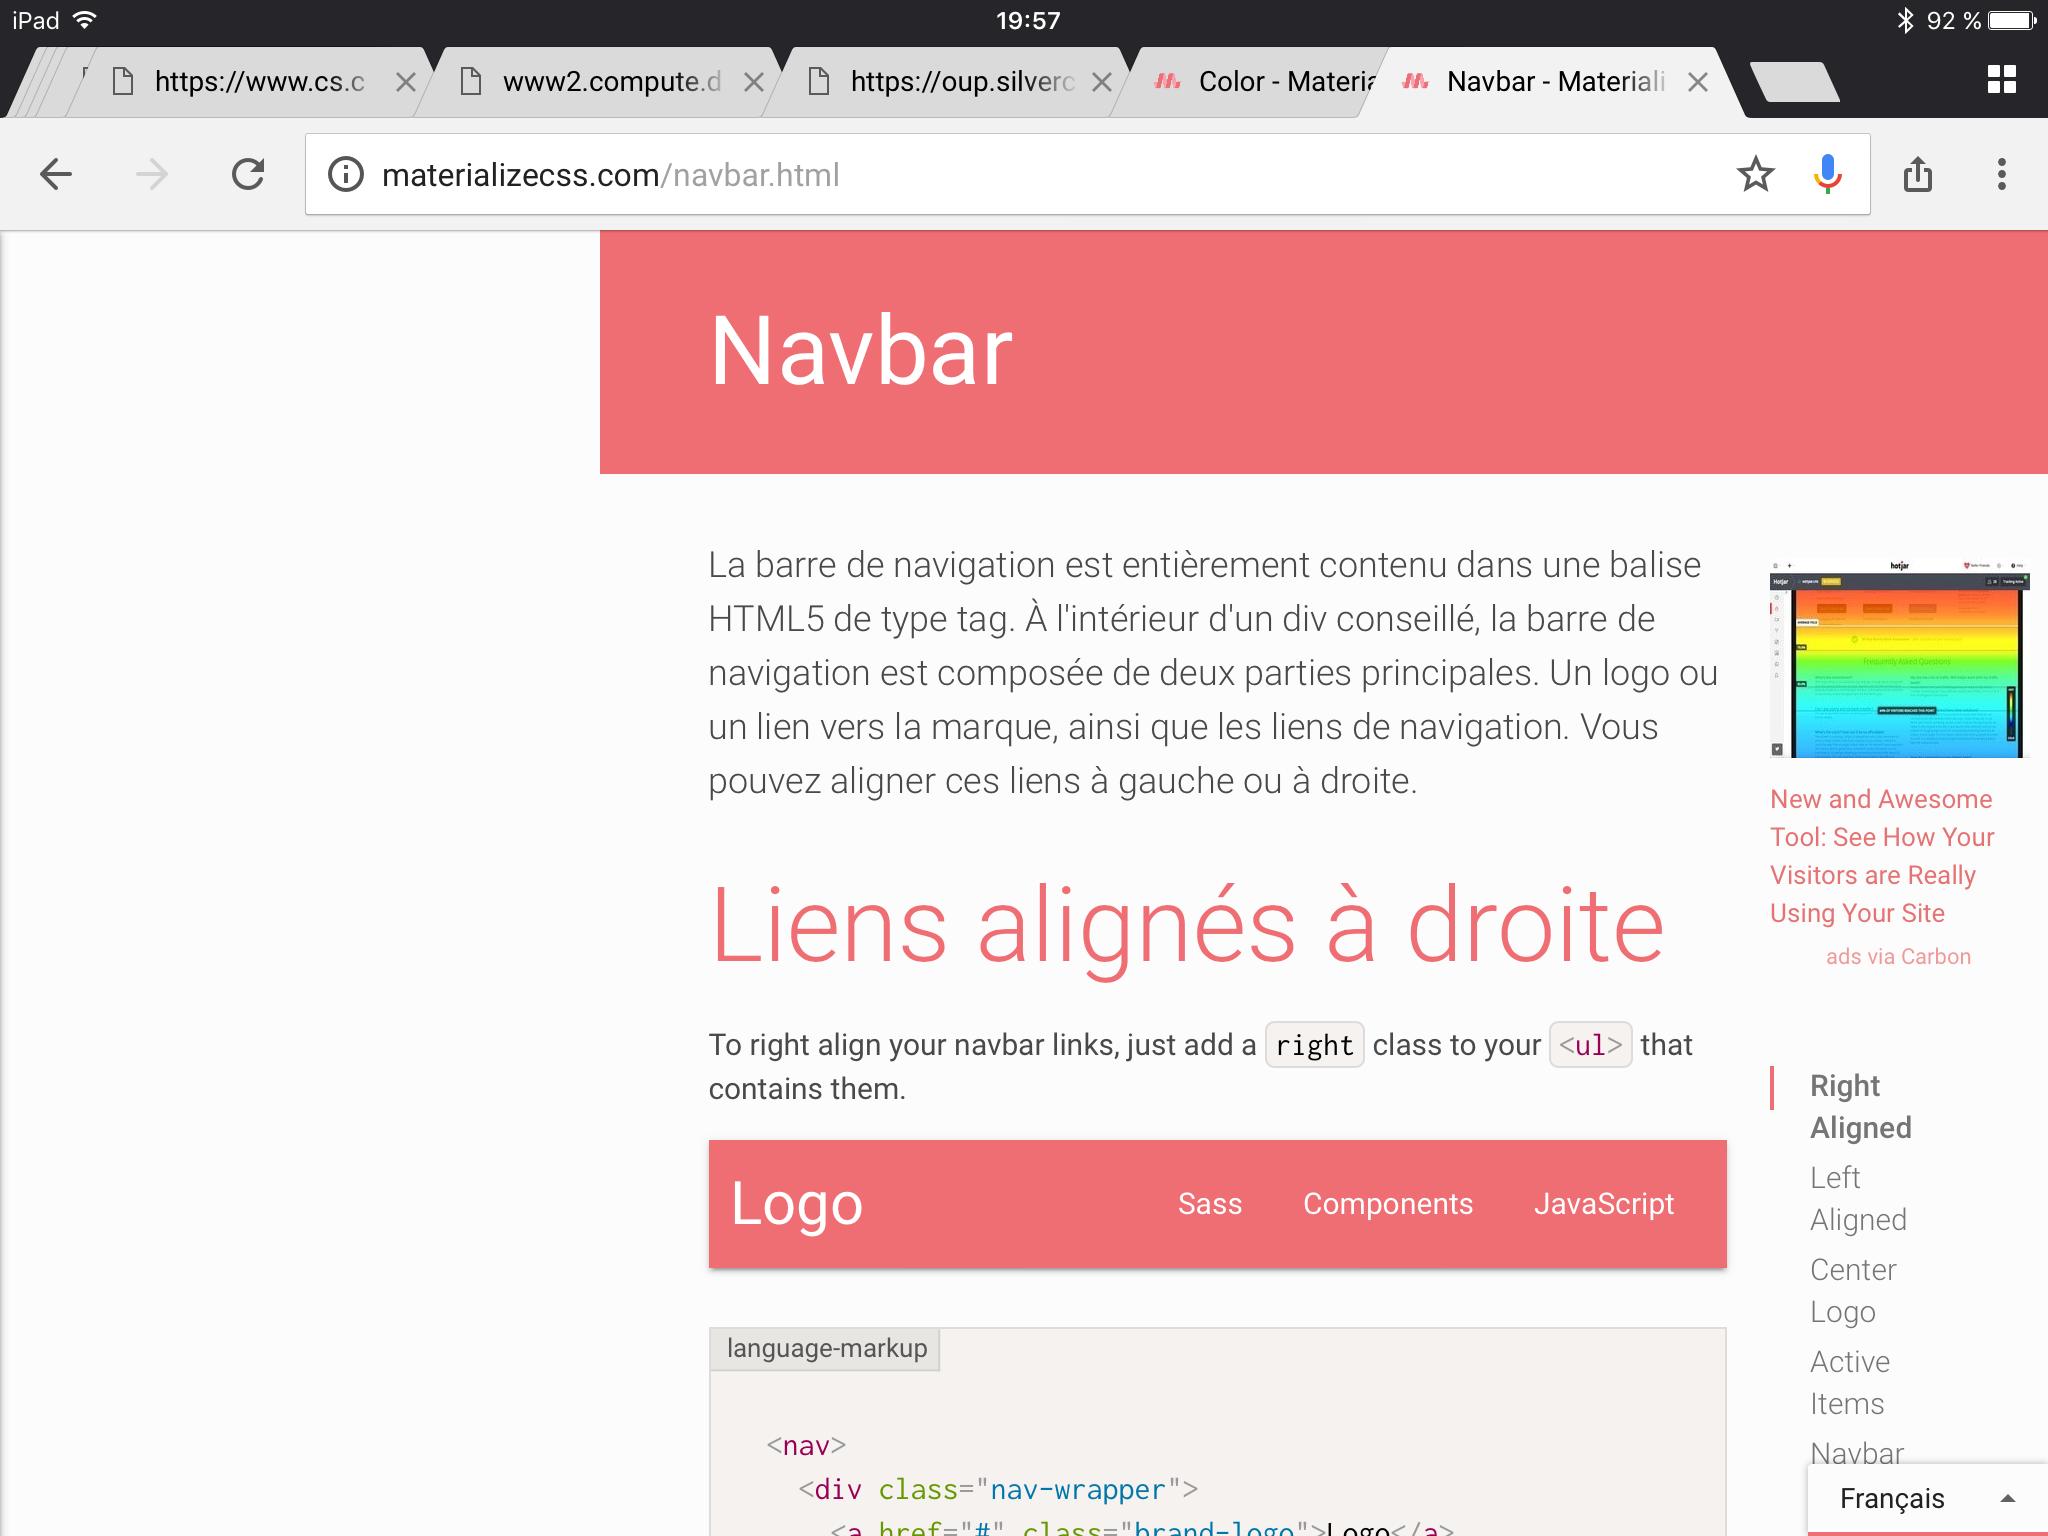 Sidenav is hidden on orientation change to landscape on iPad · Issue